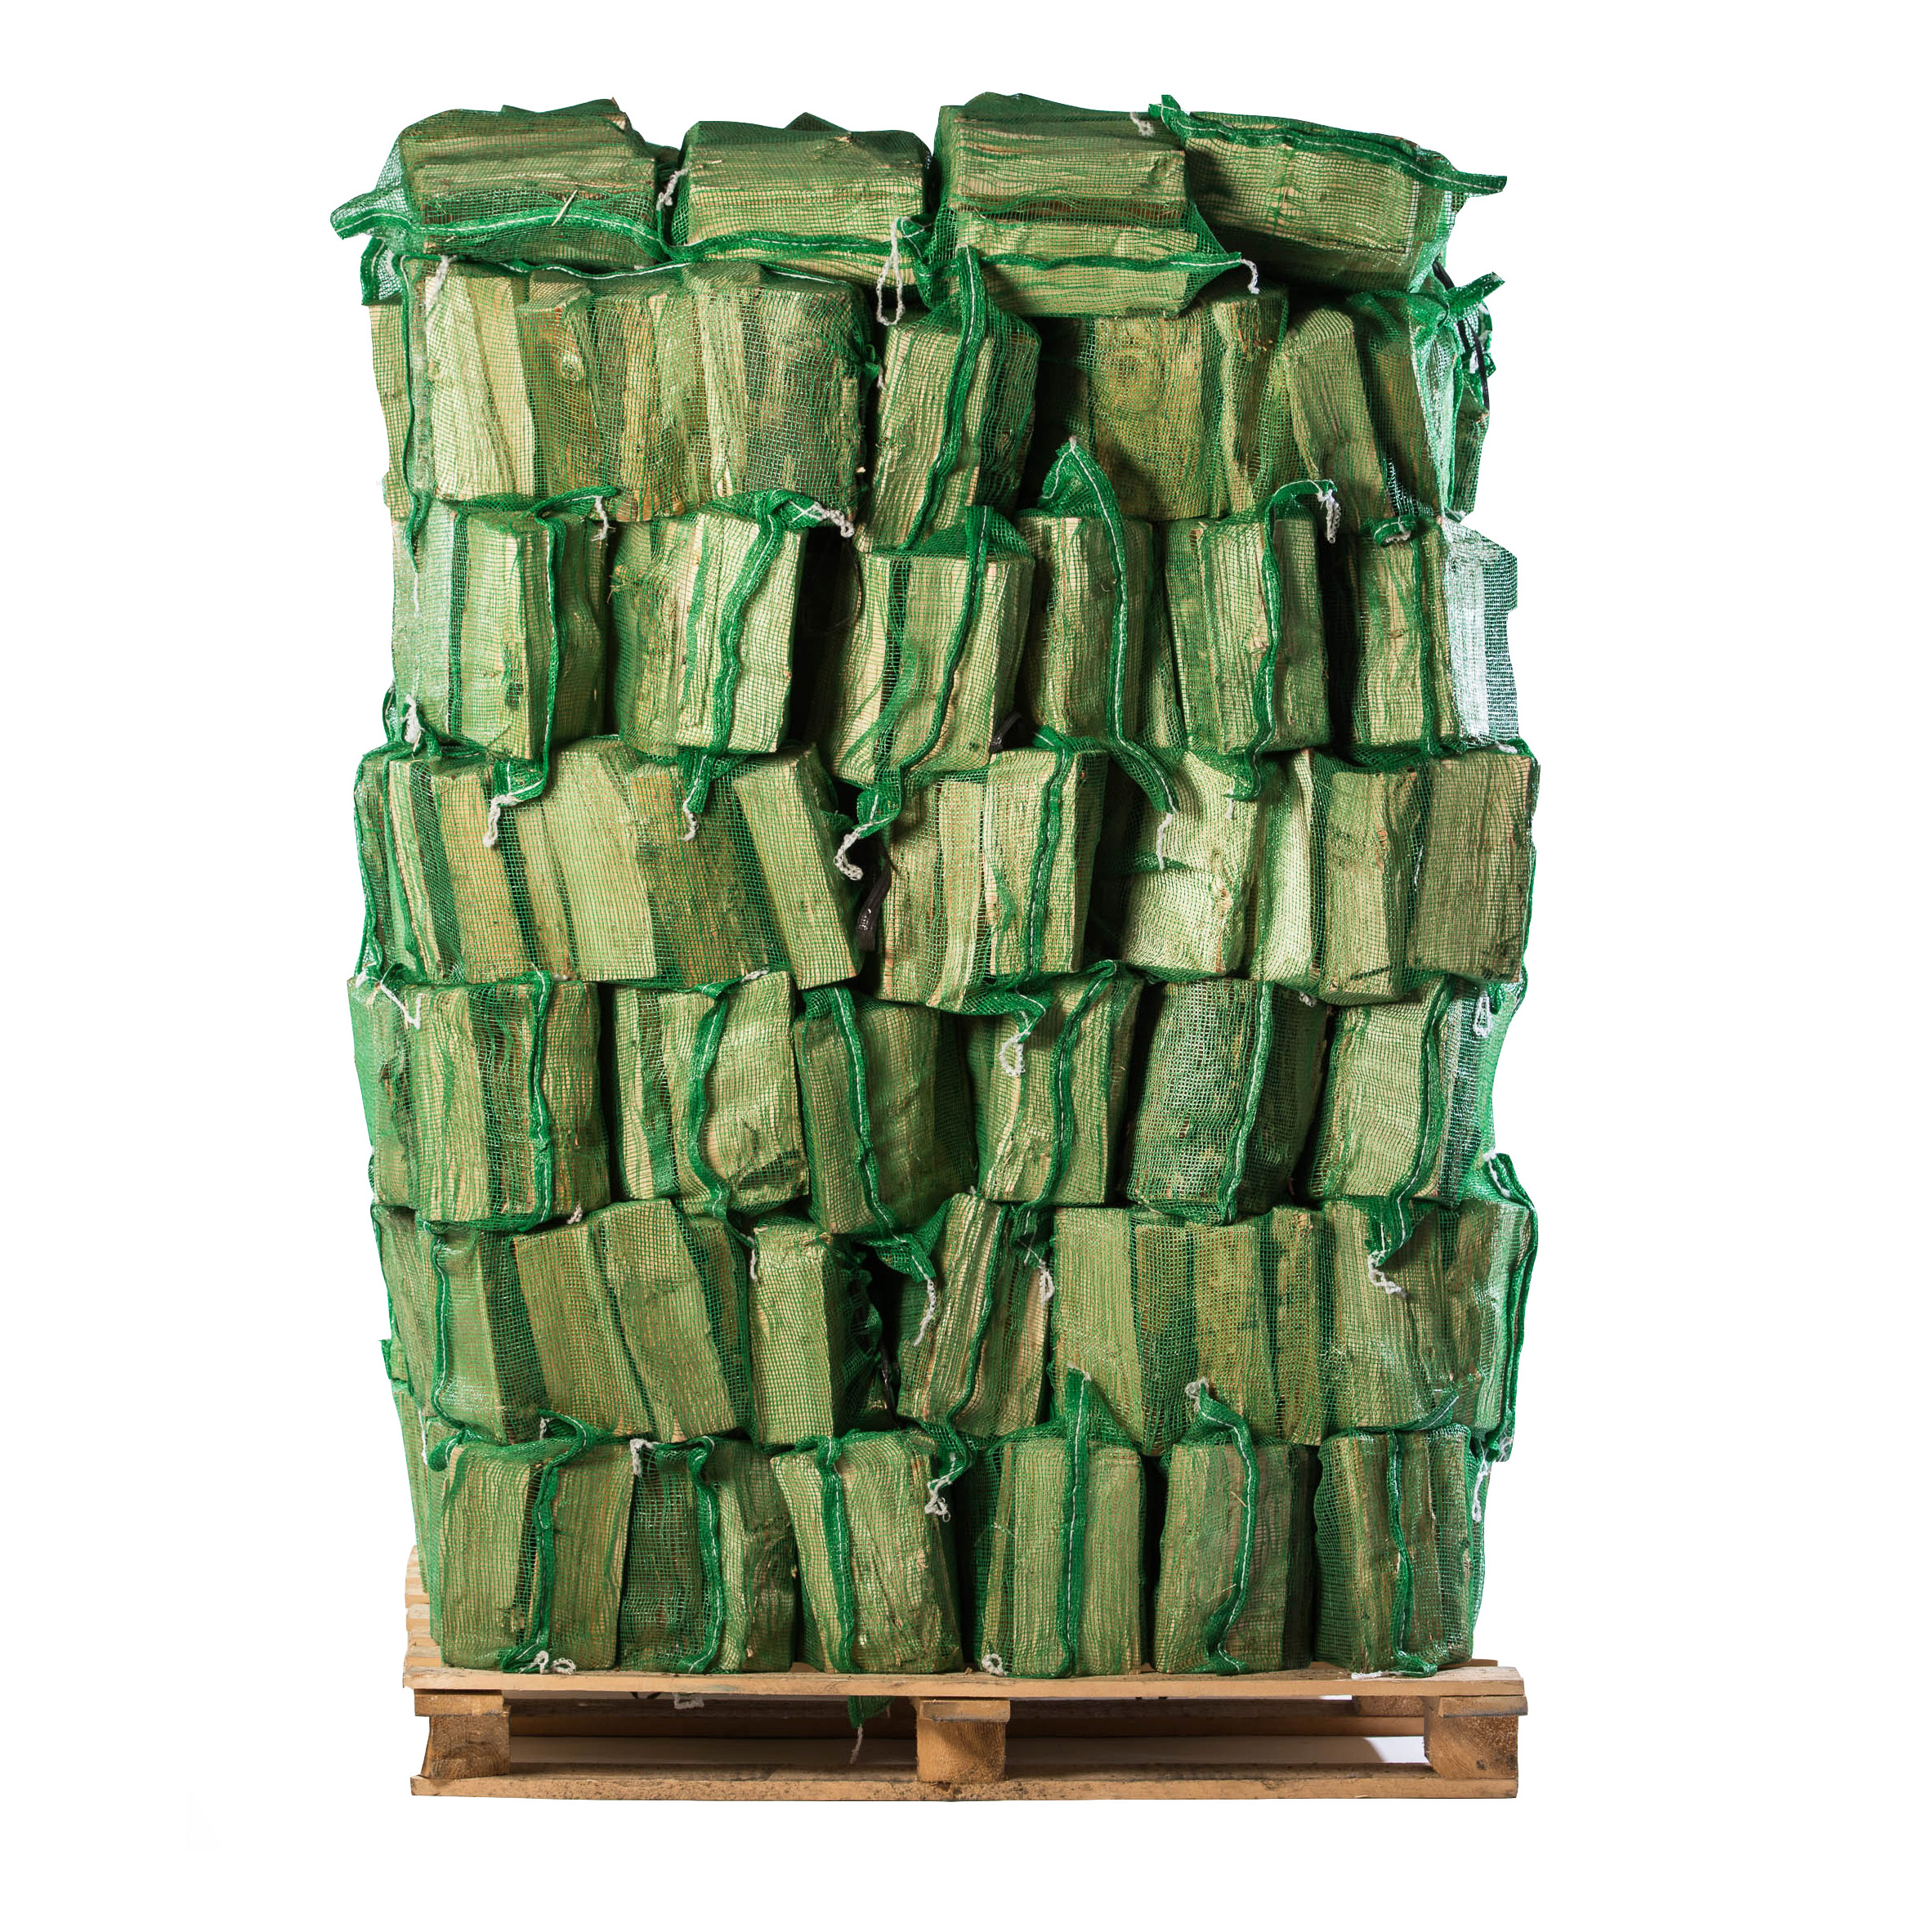 Kiln Dried Softwood Logs